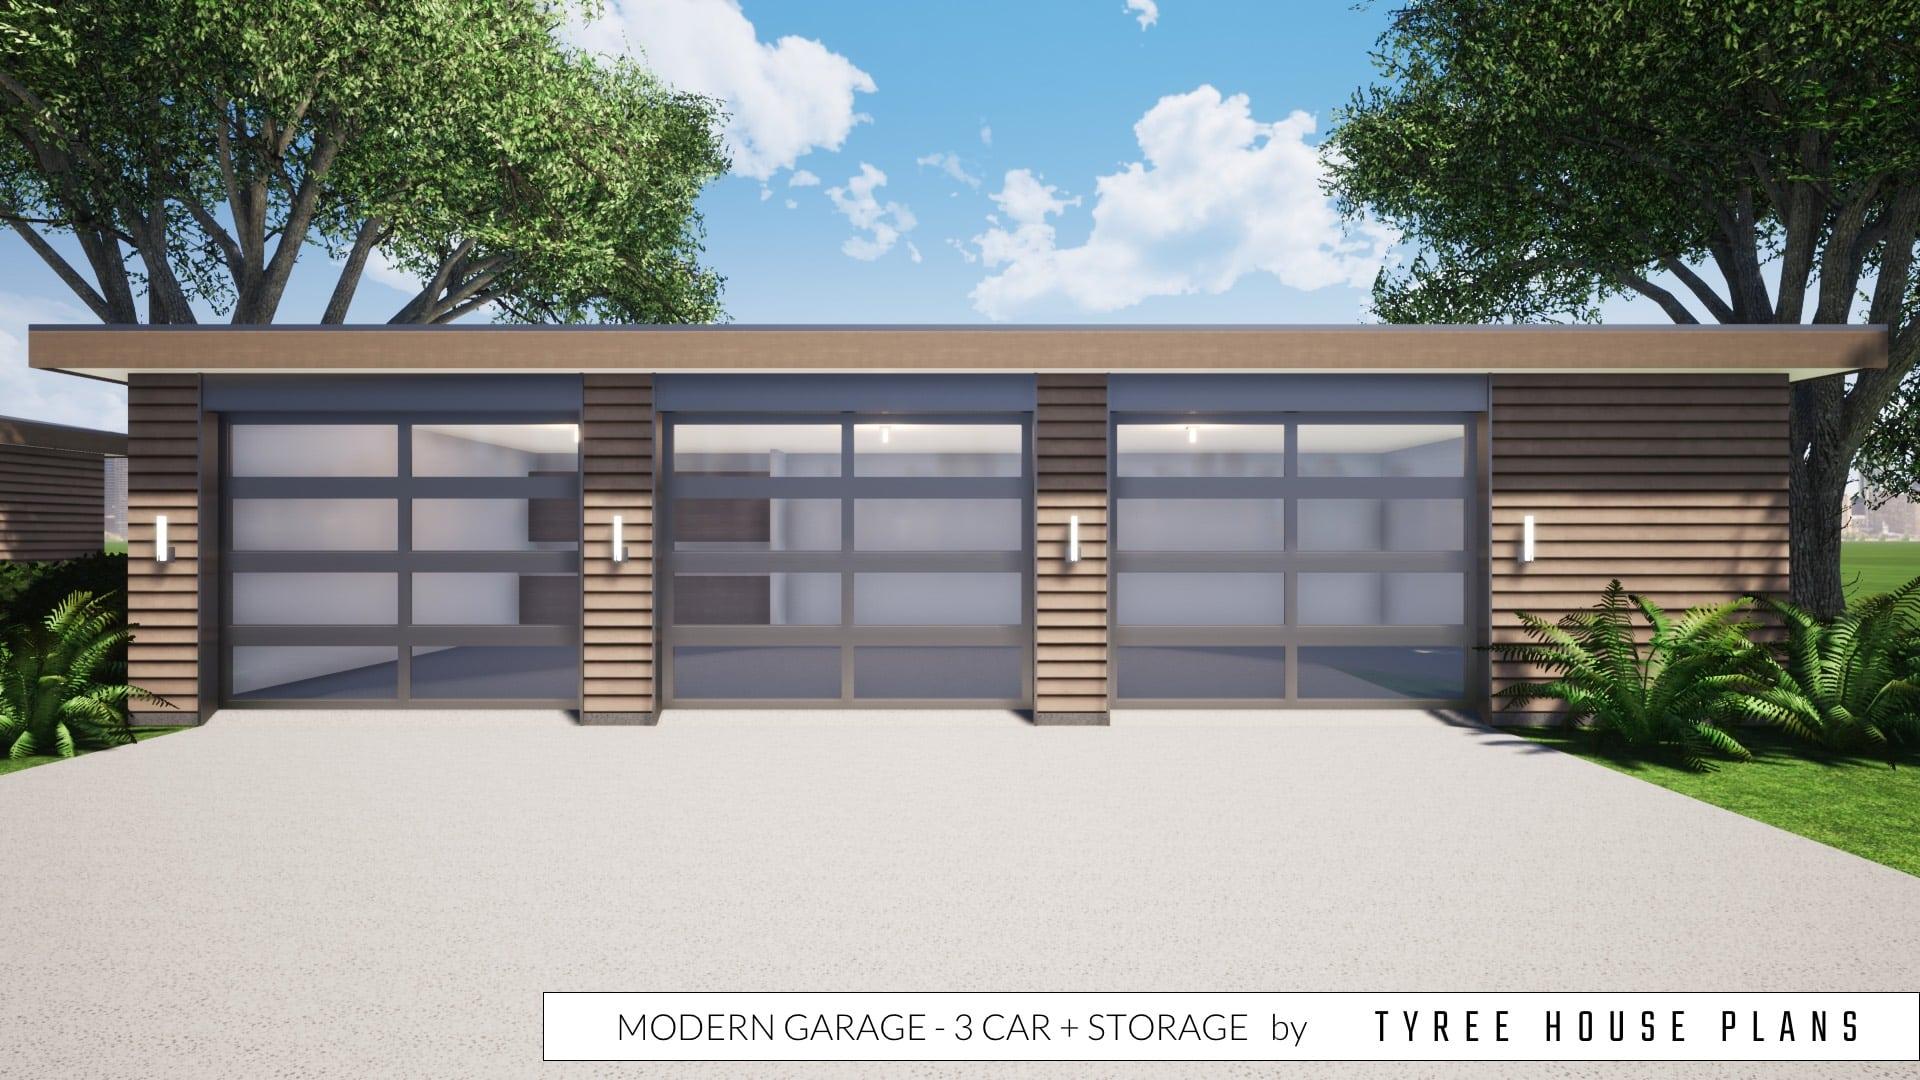 Modern Garage - 3 Car plus Storage by Tyree House Plans